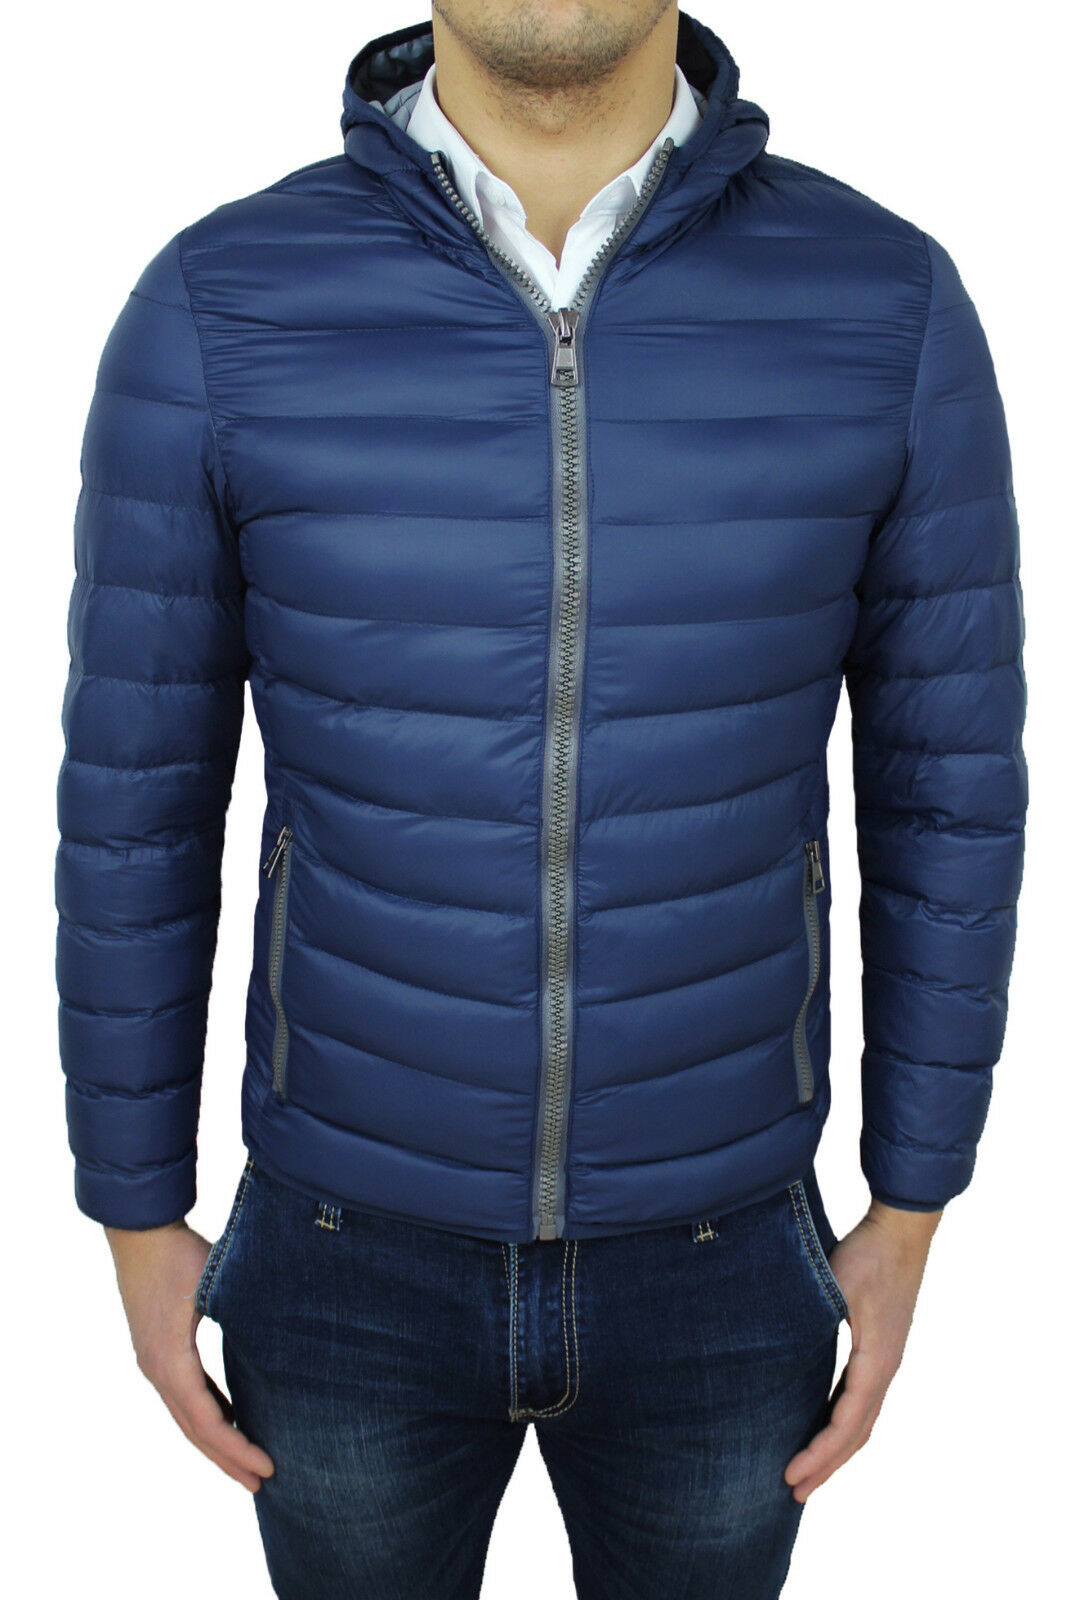 Jacke Daunenjacke Herren Diamant Casual Blau Slim Fit Jacke Jacke mit Kapuze